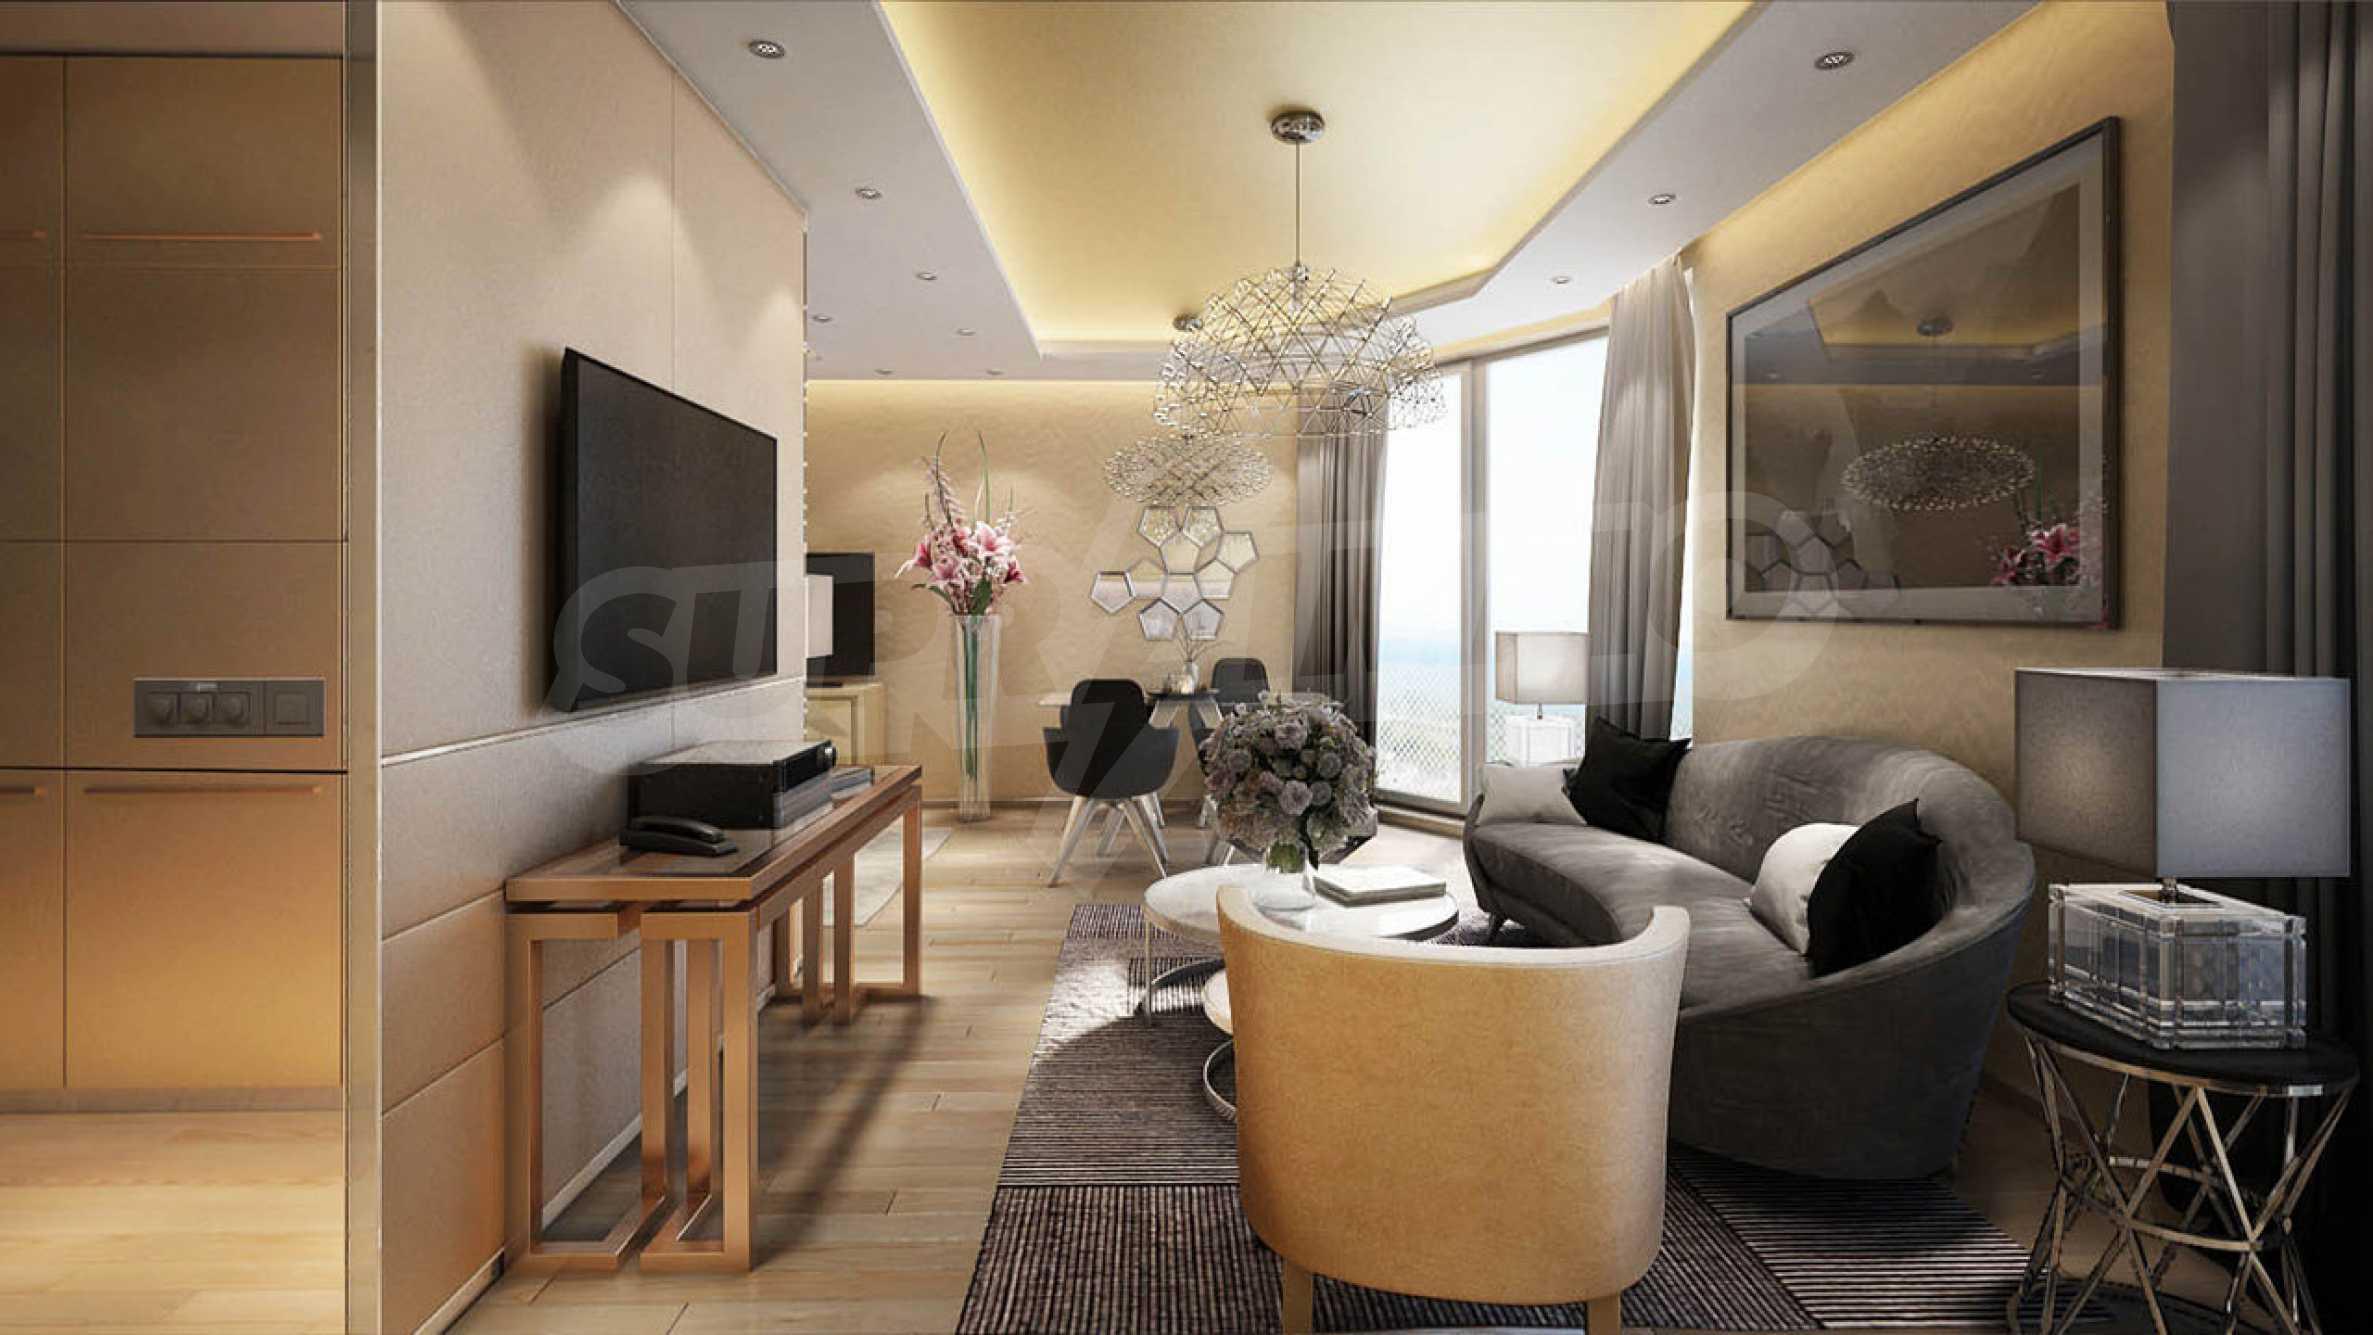 Нова сграда с луксозни апартаменти в гр. Бургас 14